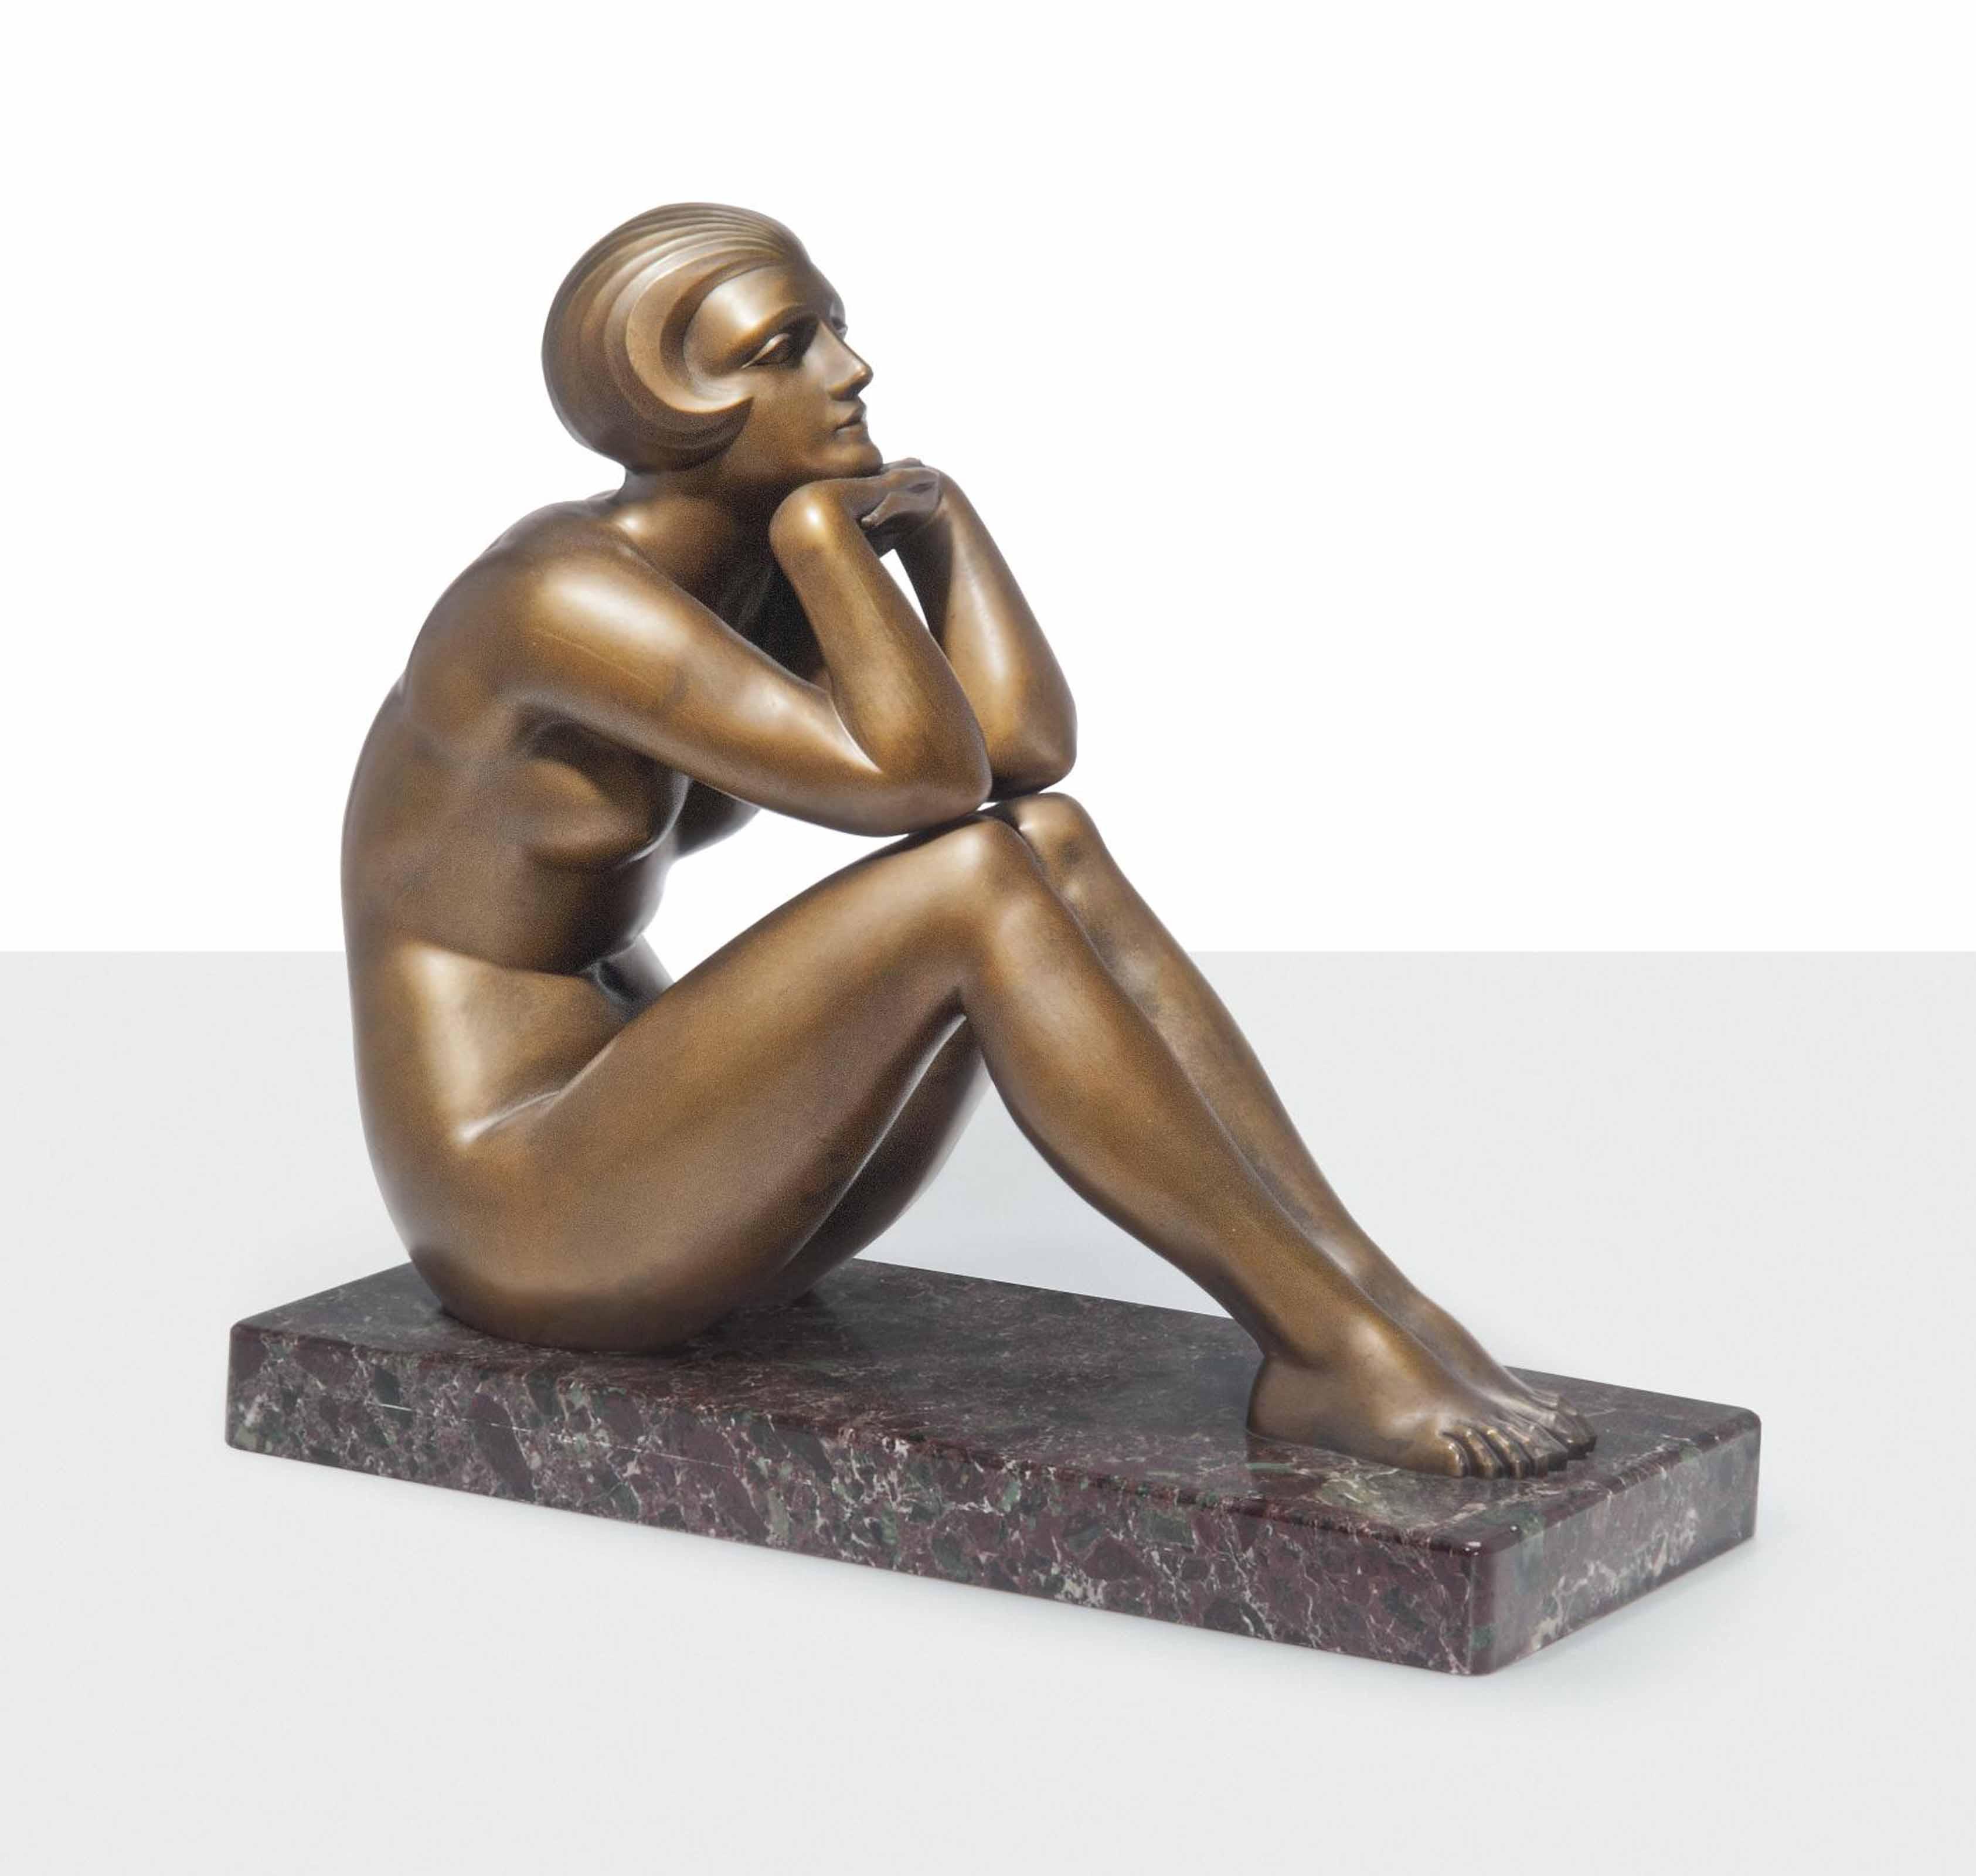 MAURICE GUIRAUD-RIVIERE (1881-1947)